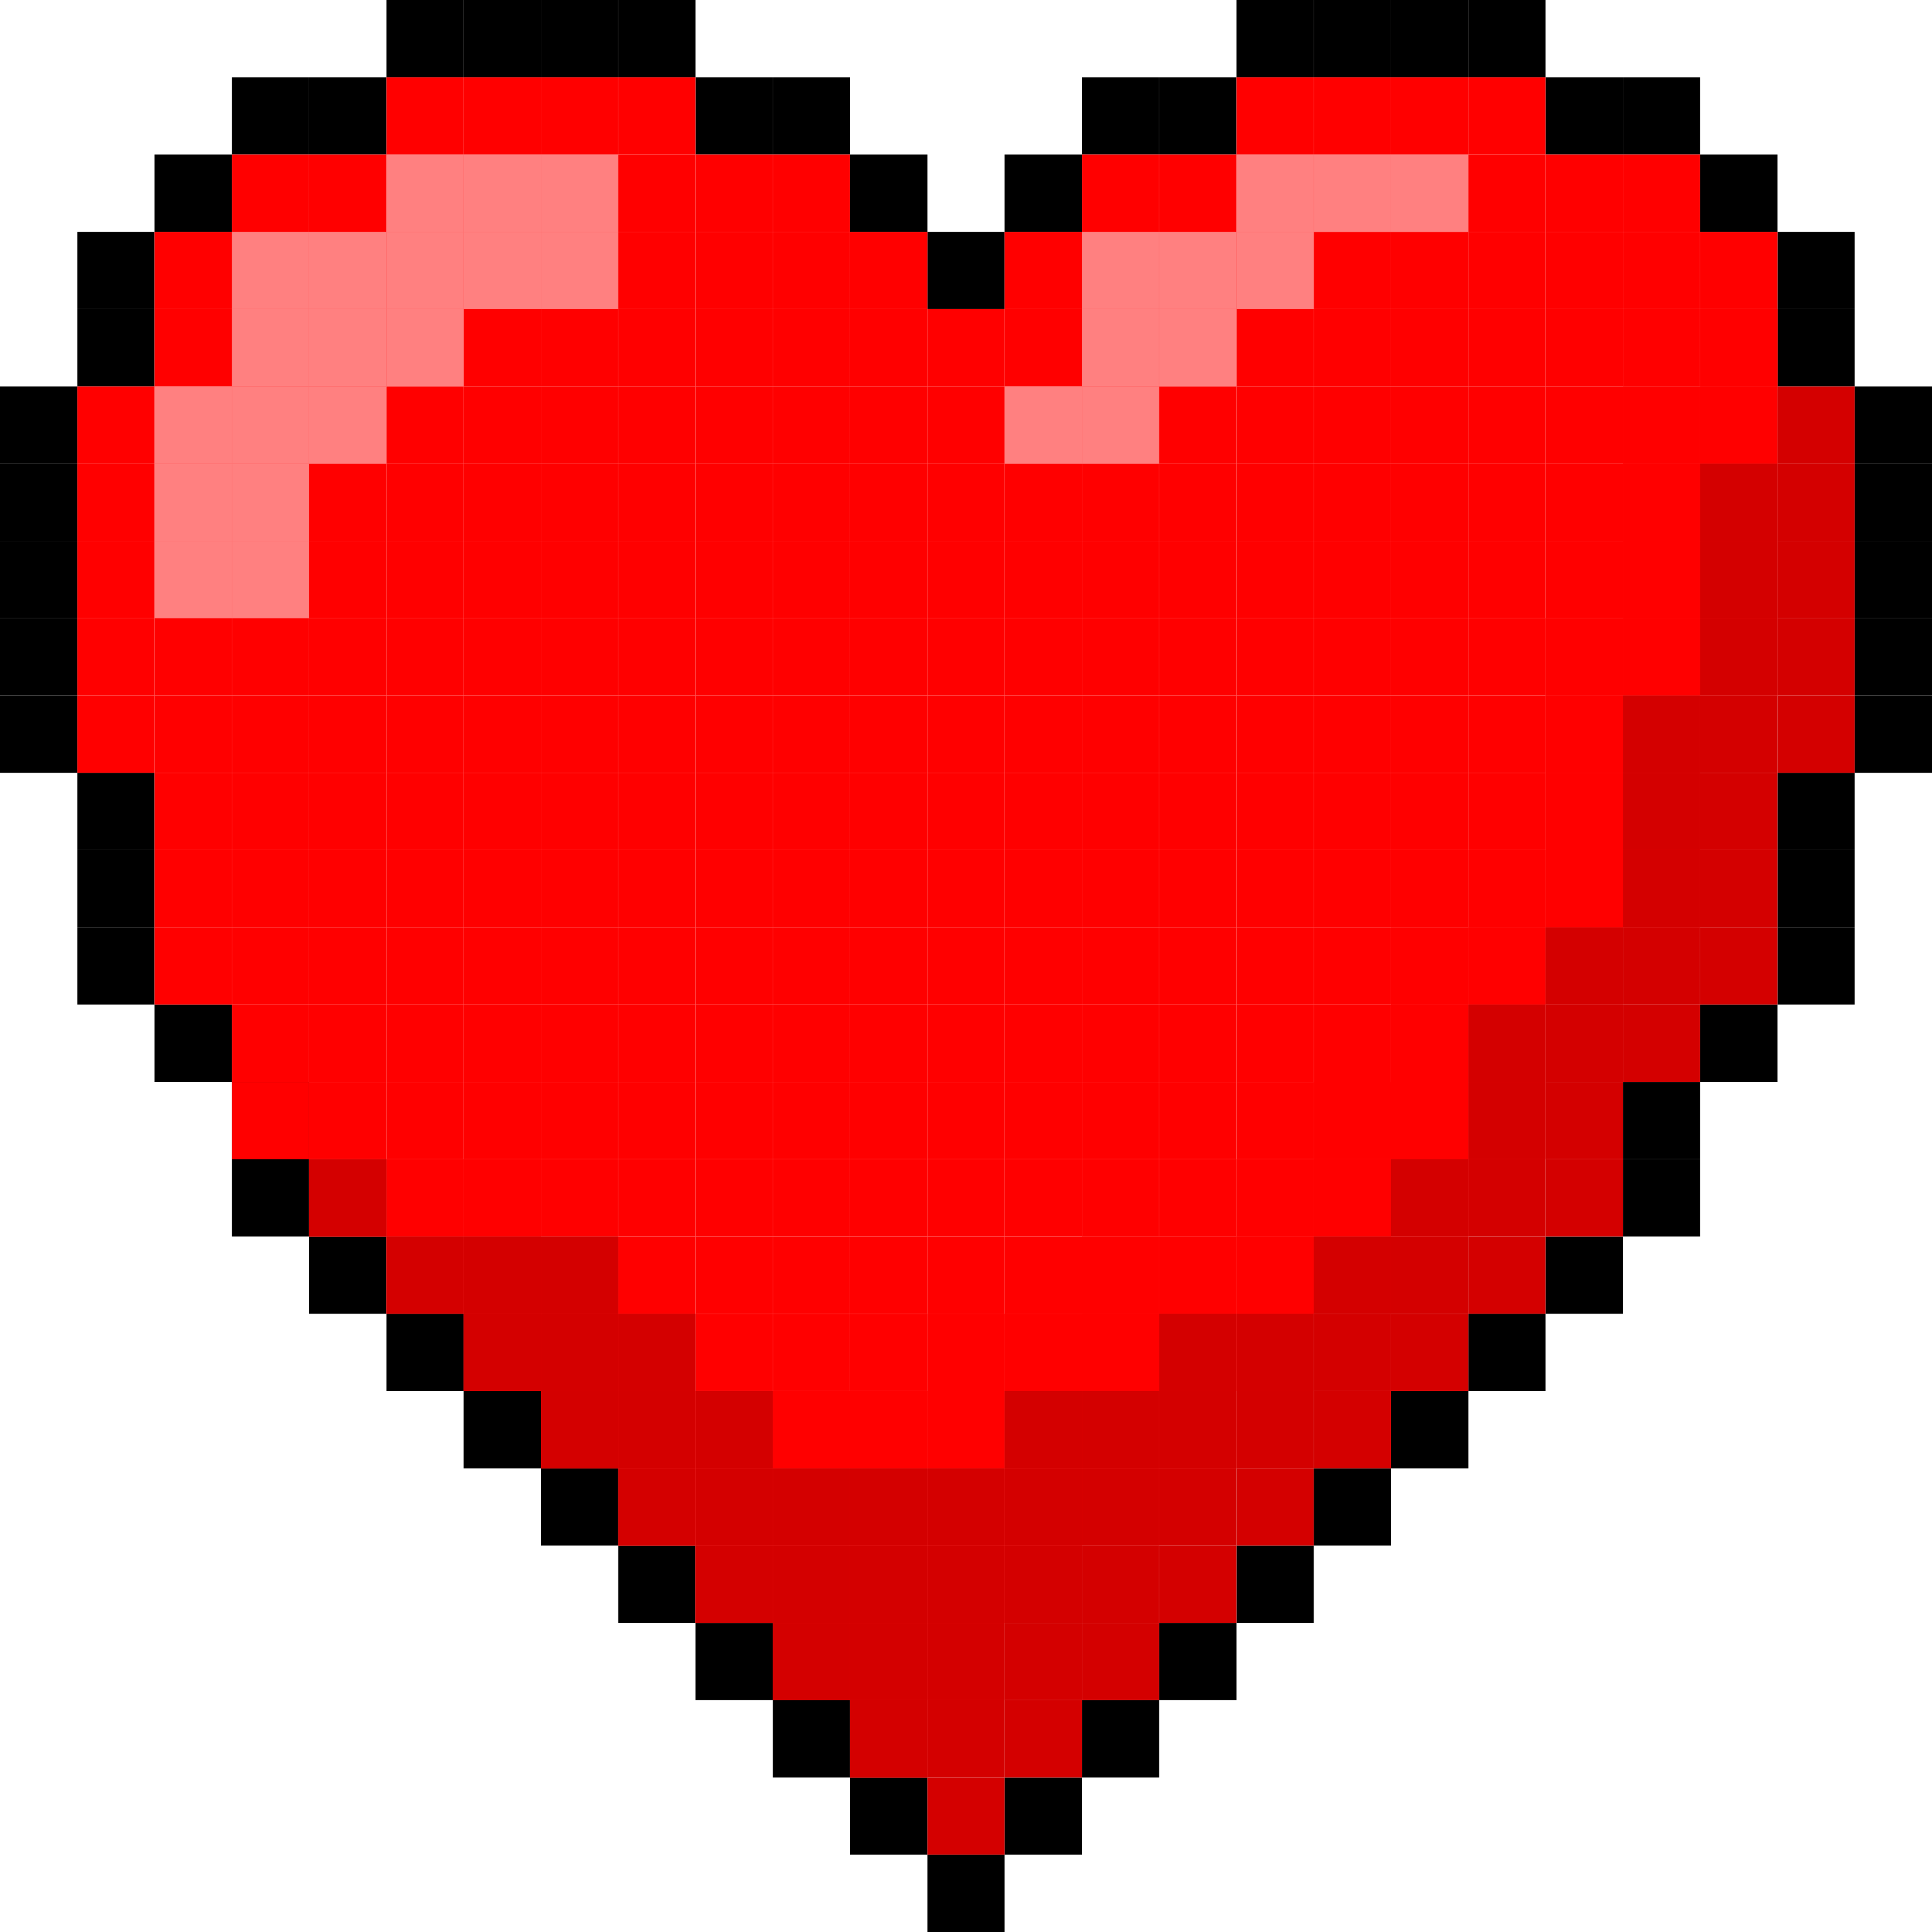 6 Pixel Heart - Pixel Art Heart Png Clipart - Full Size ...